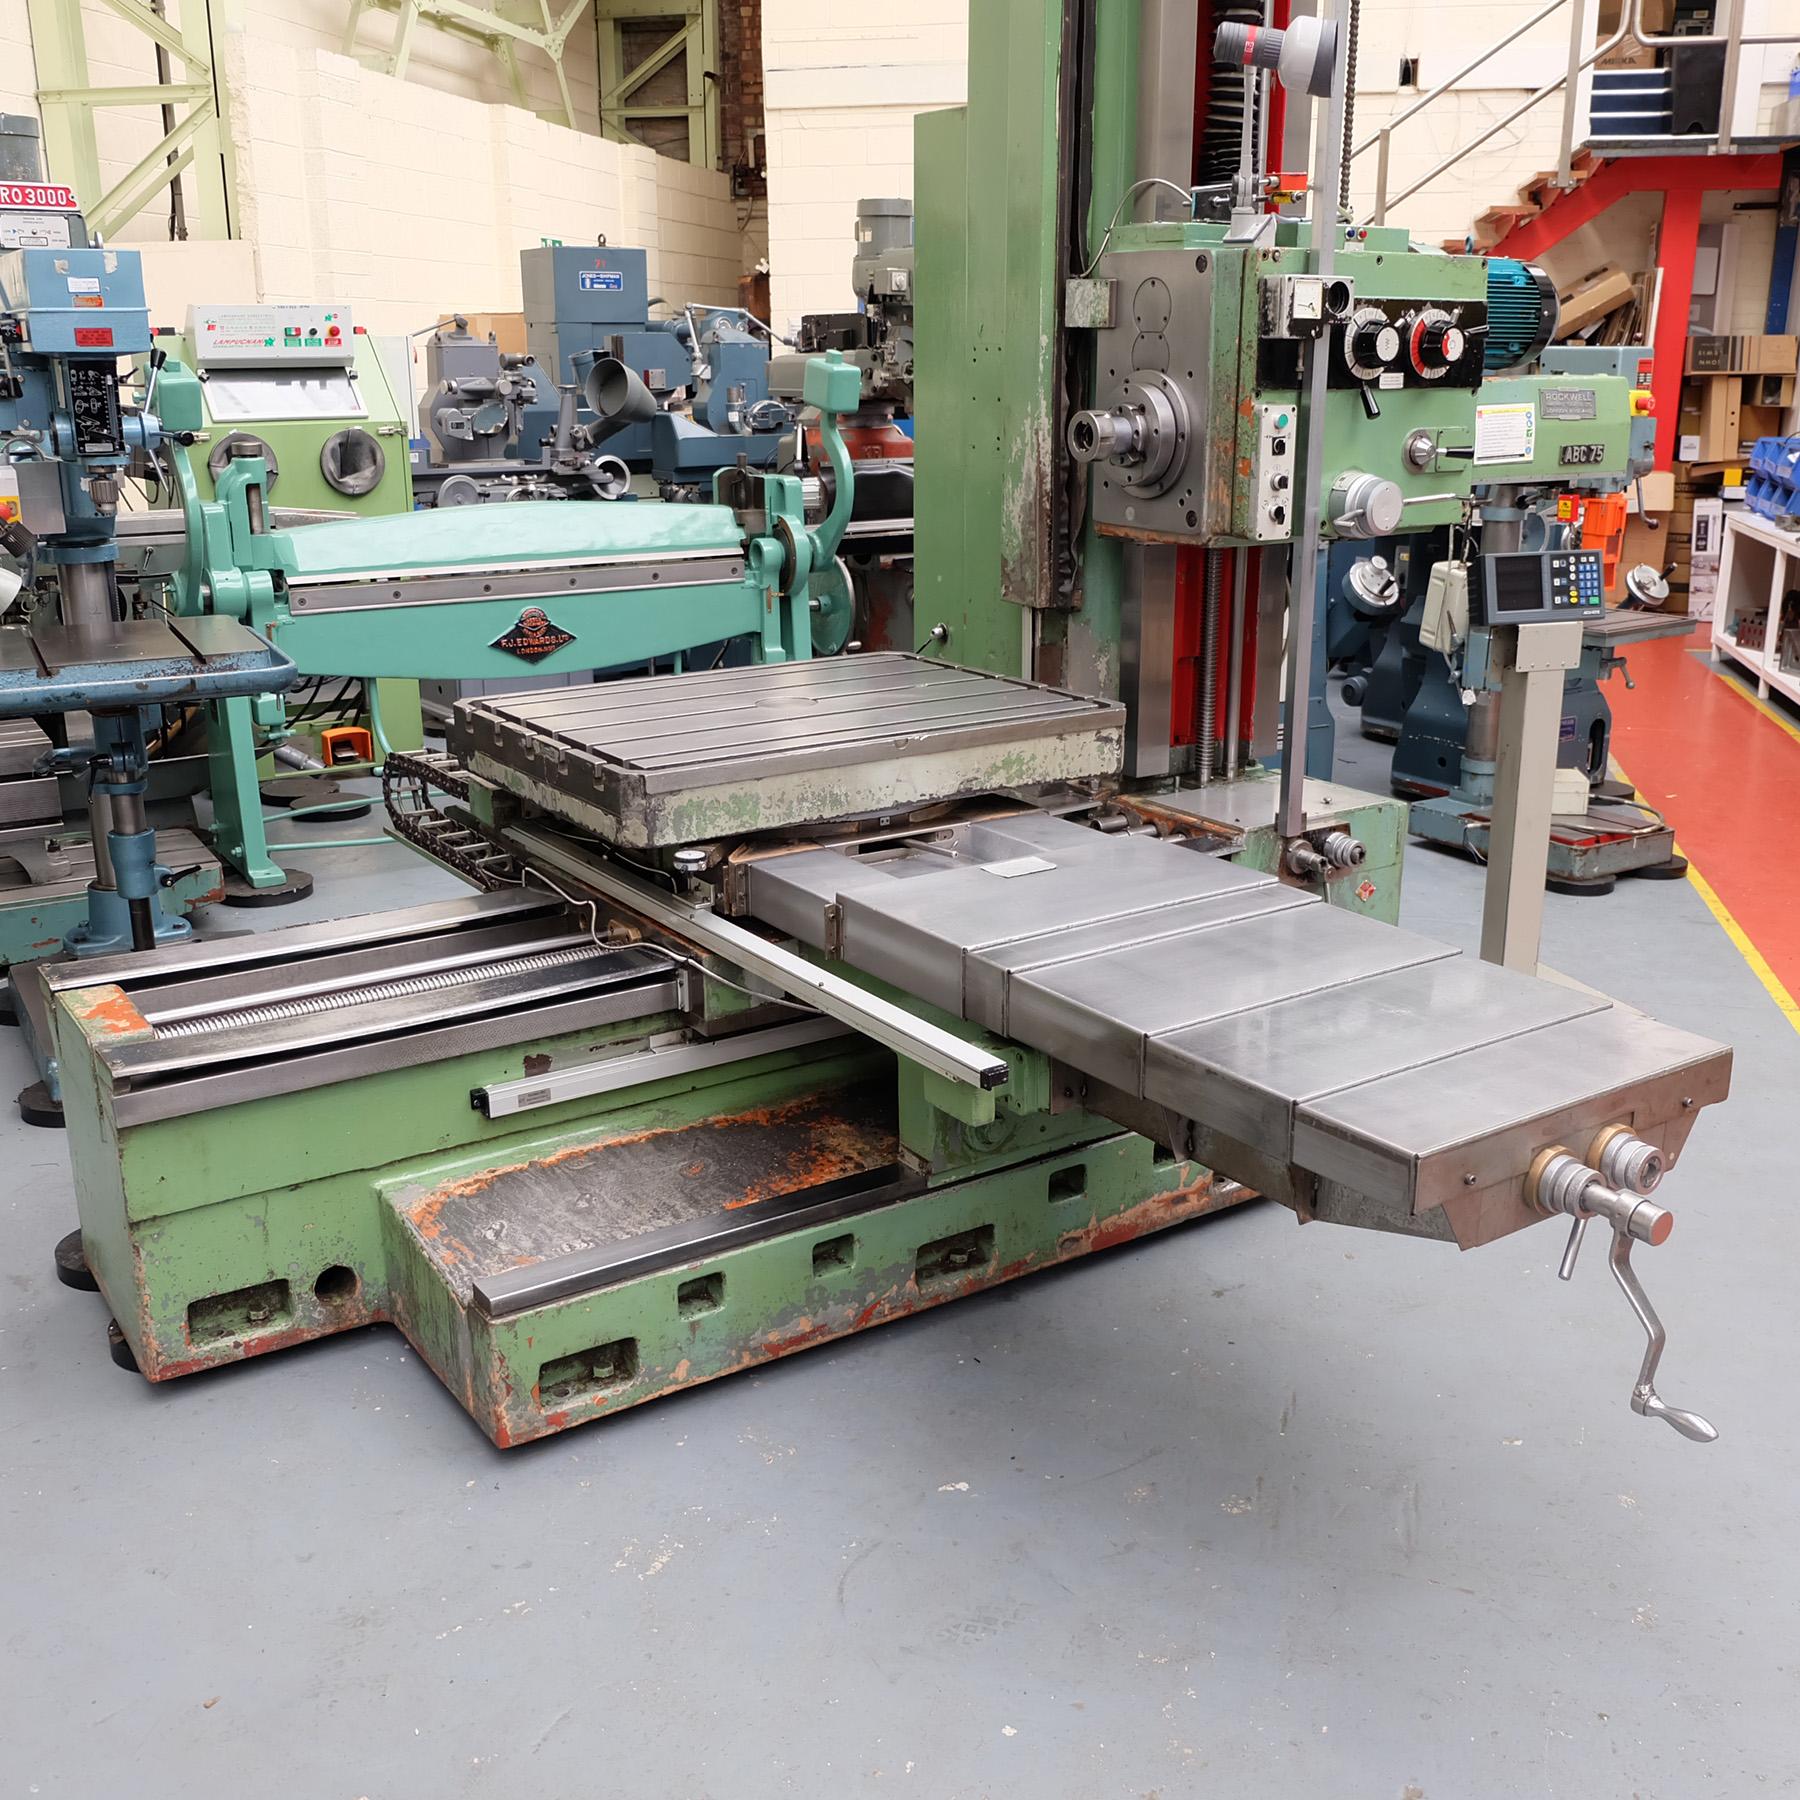 Ceruti Model ABC 75 Horizontal Boring & Milling Machine. With Tooling. - Image 3 of 15